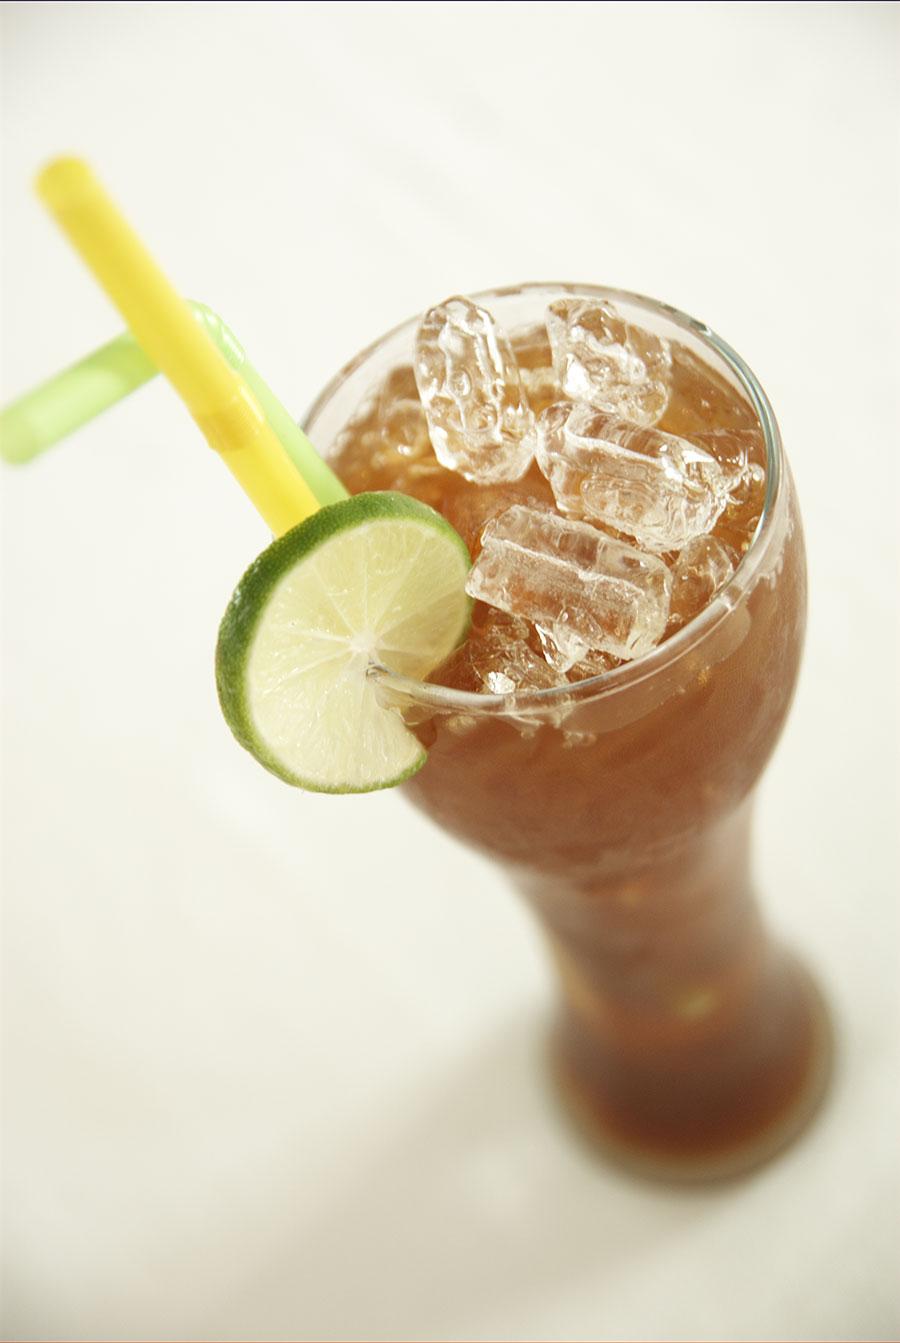 Cool drink © Pixel Planet Design